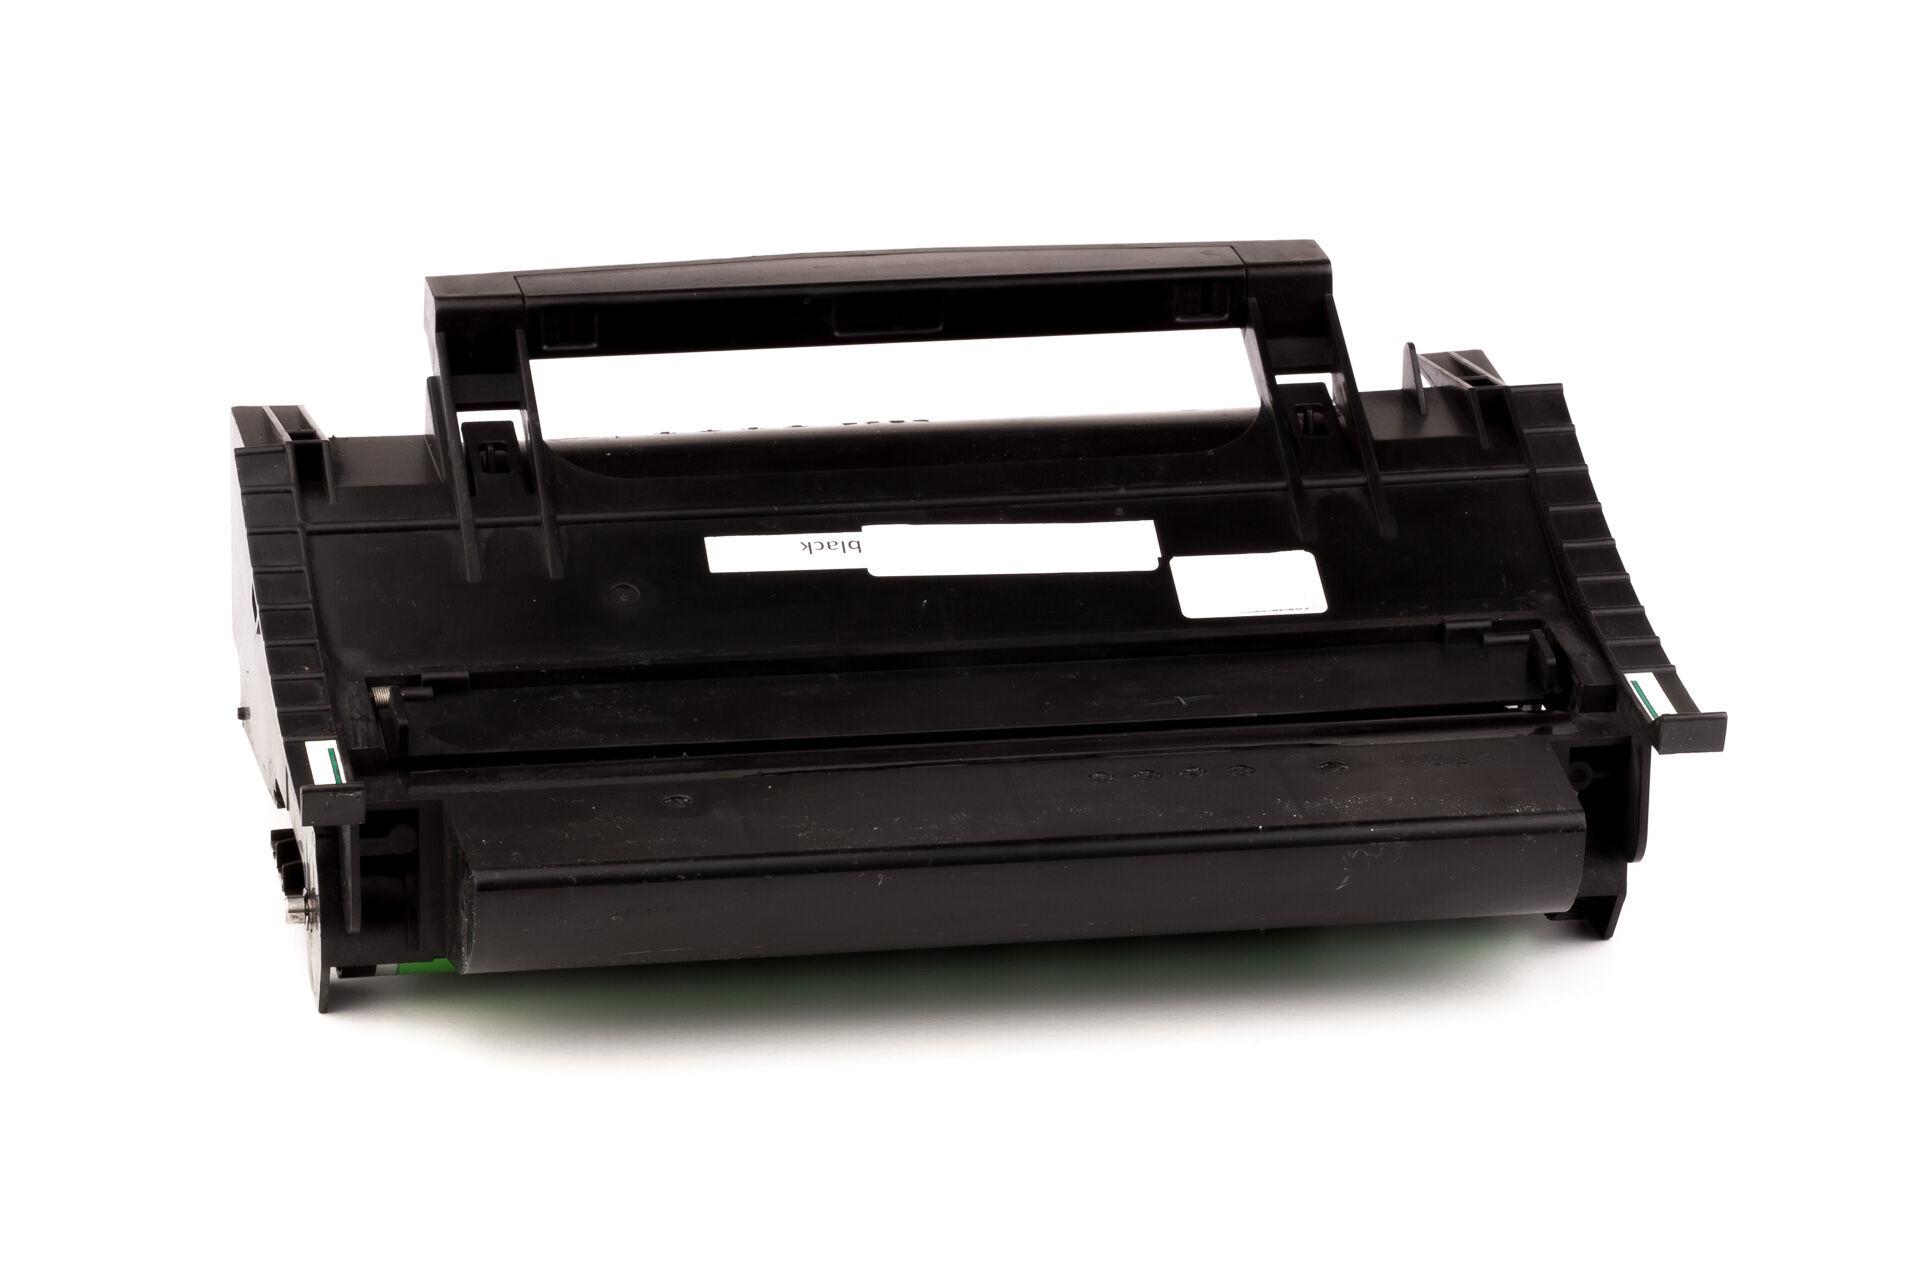 Lexmark Cartouche de Toner pour Lexmark 4K00199 noir compatible (de marque ASC)